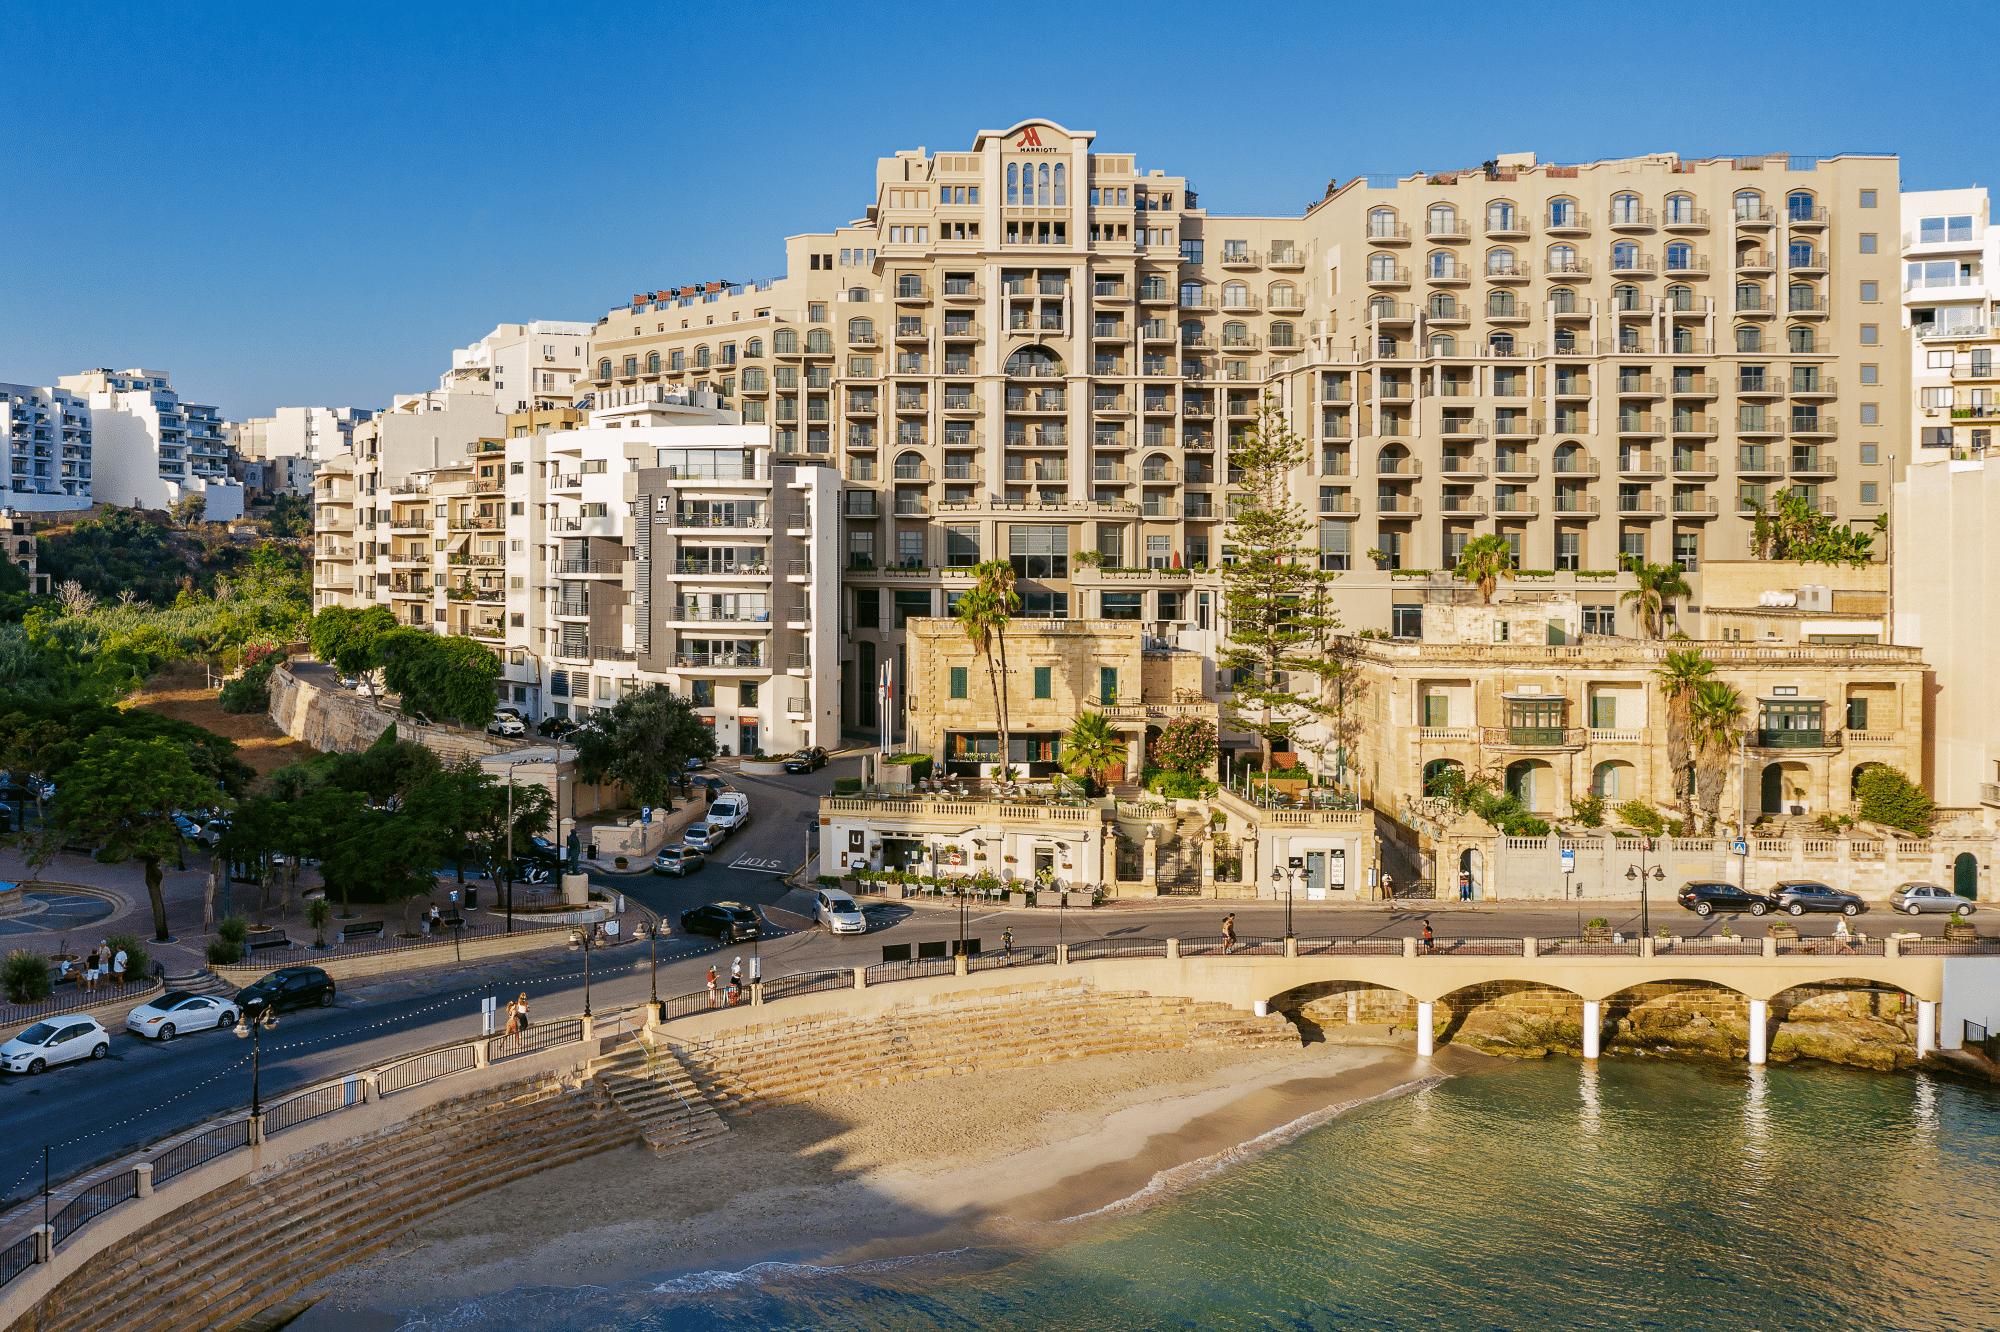 Marriott Malta exterior shot and beach